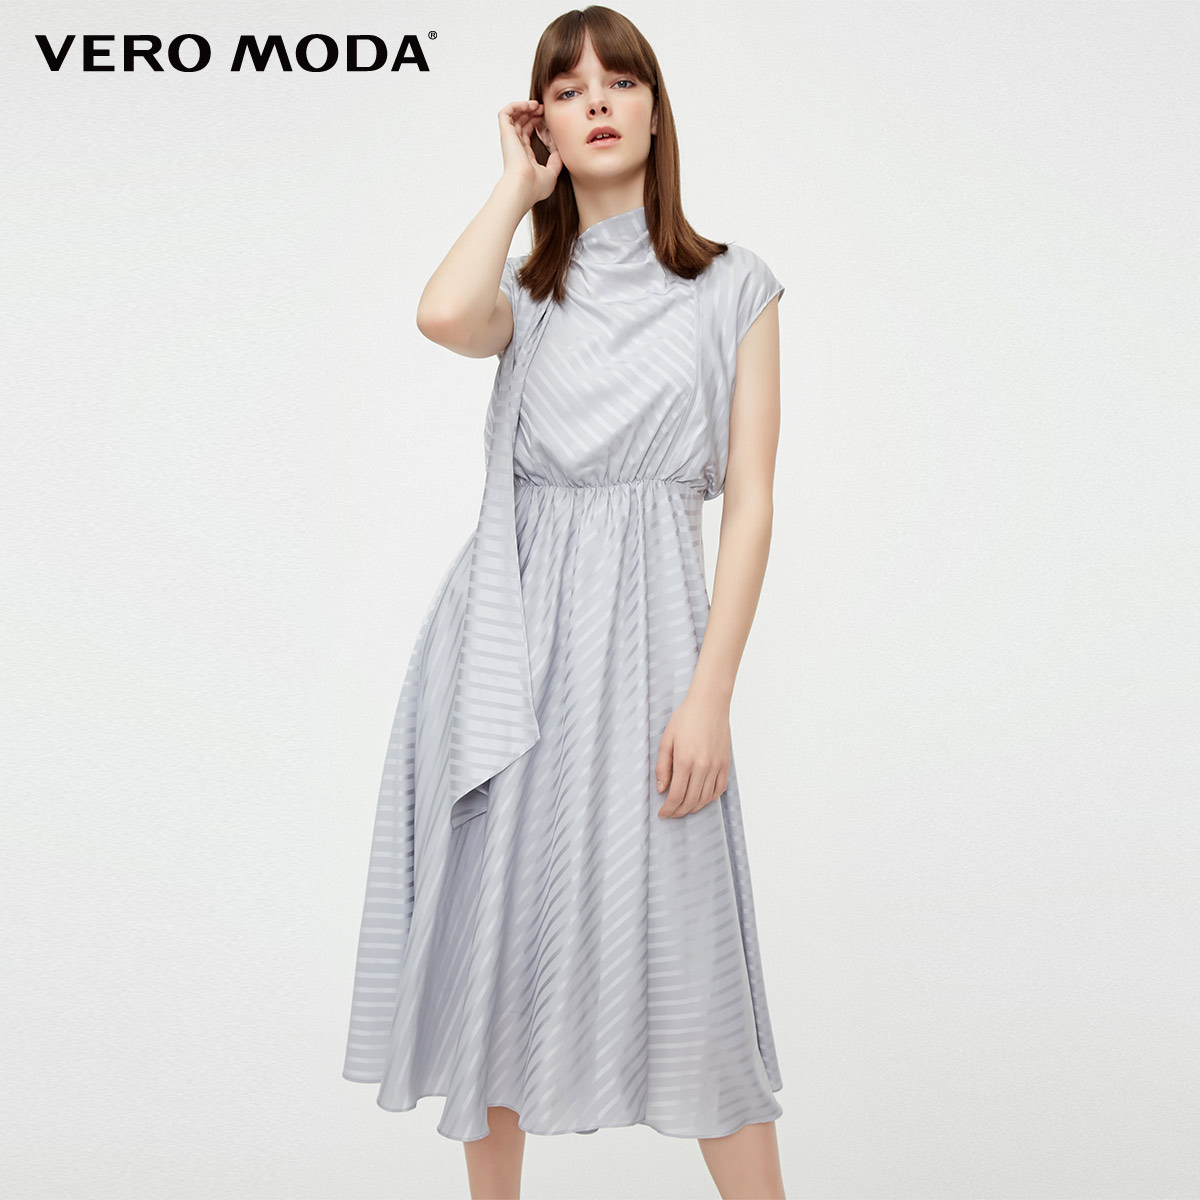 Vero Moda Women's Stripe Print Sleeveless Dress | 31927B502